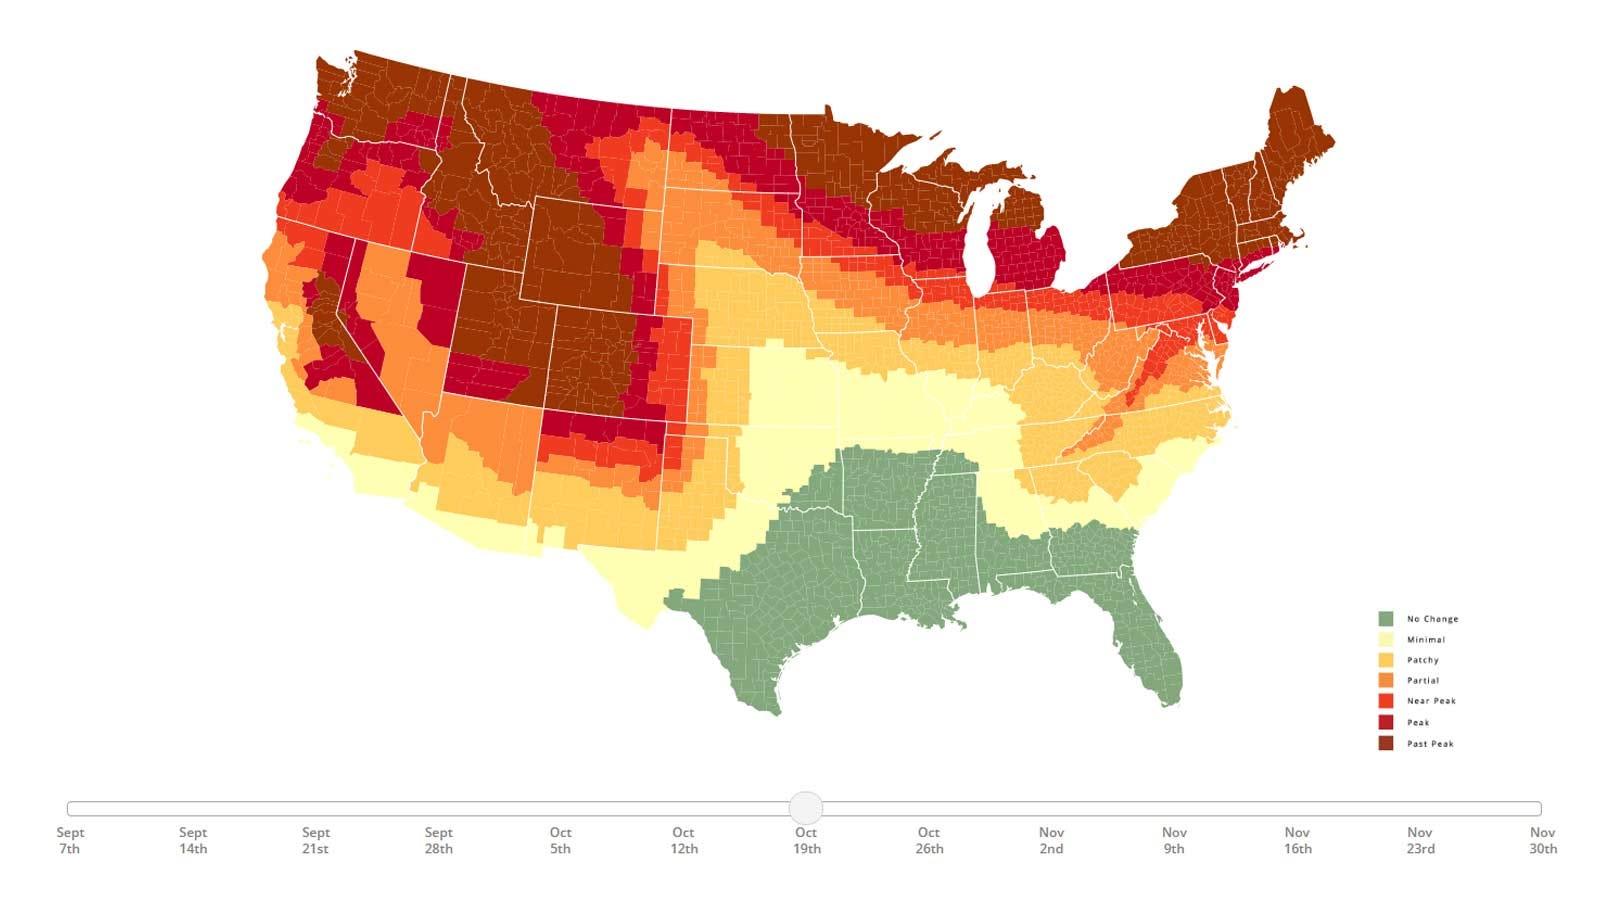 The Fall Foliage Prediction Mapfor October 19, 2019, at SmokyMountains.com.